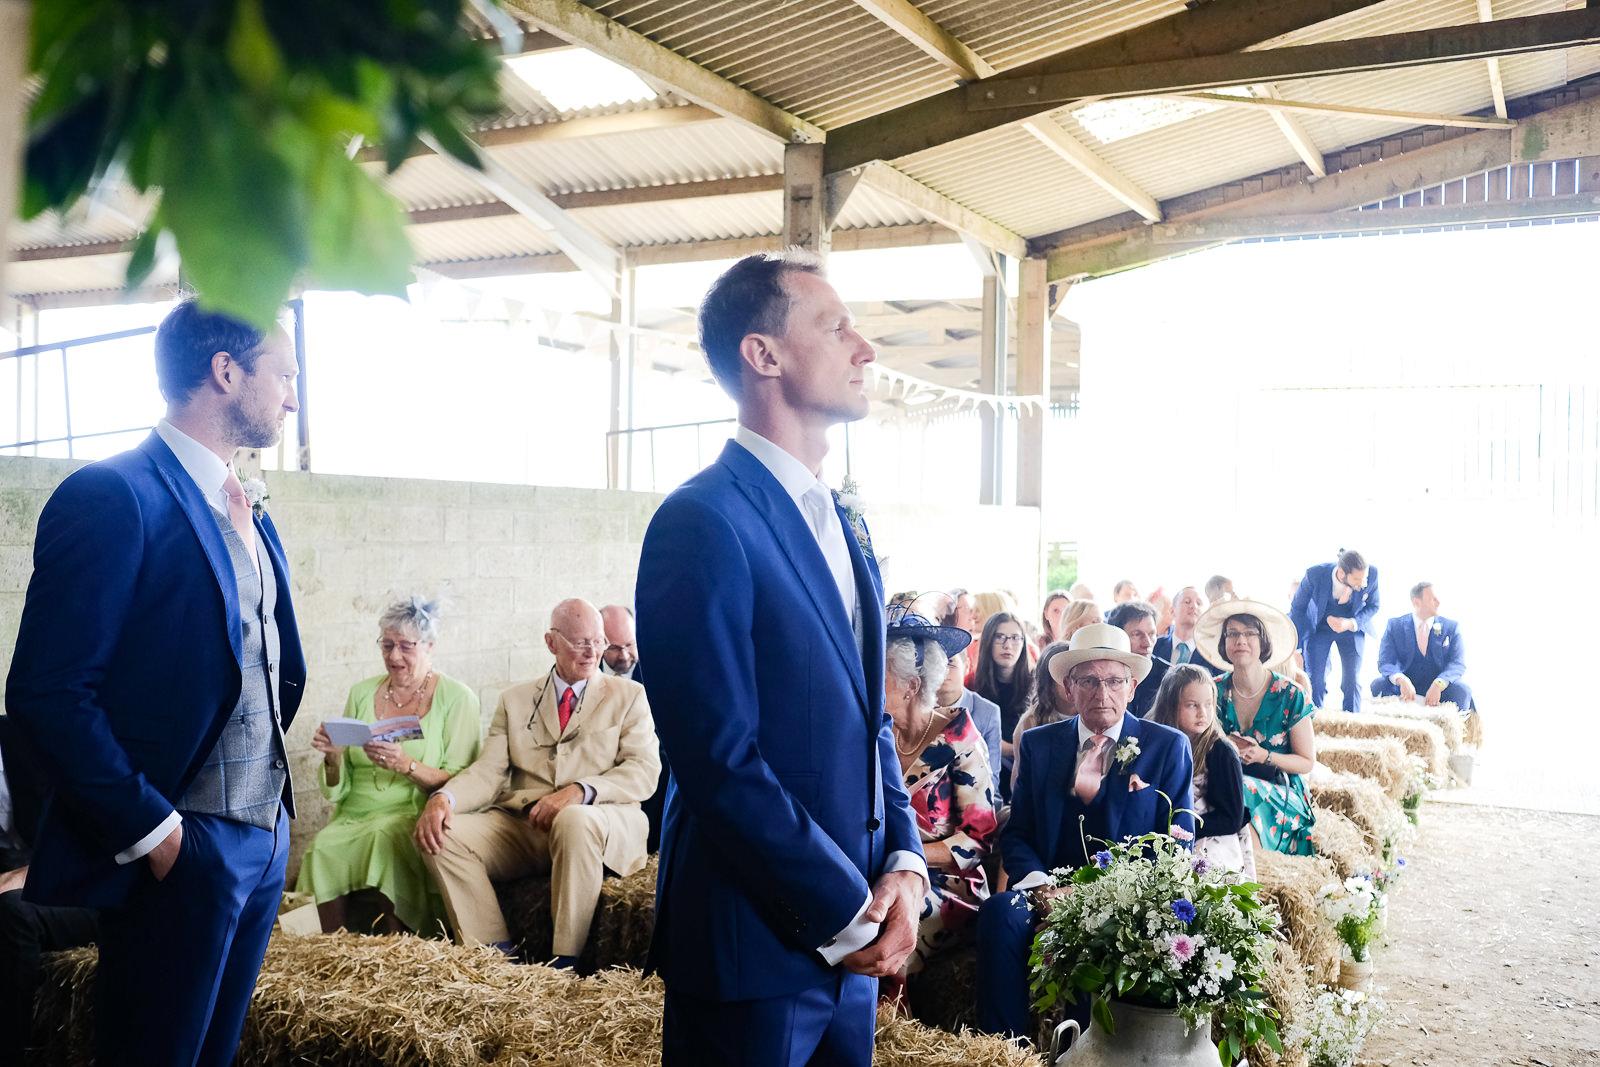 Roscarrock Farm wedding in Cornwall 027.jpg